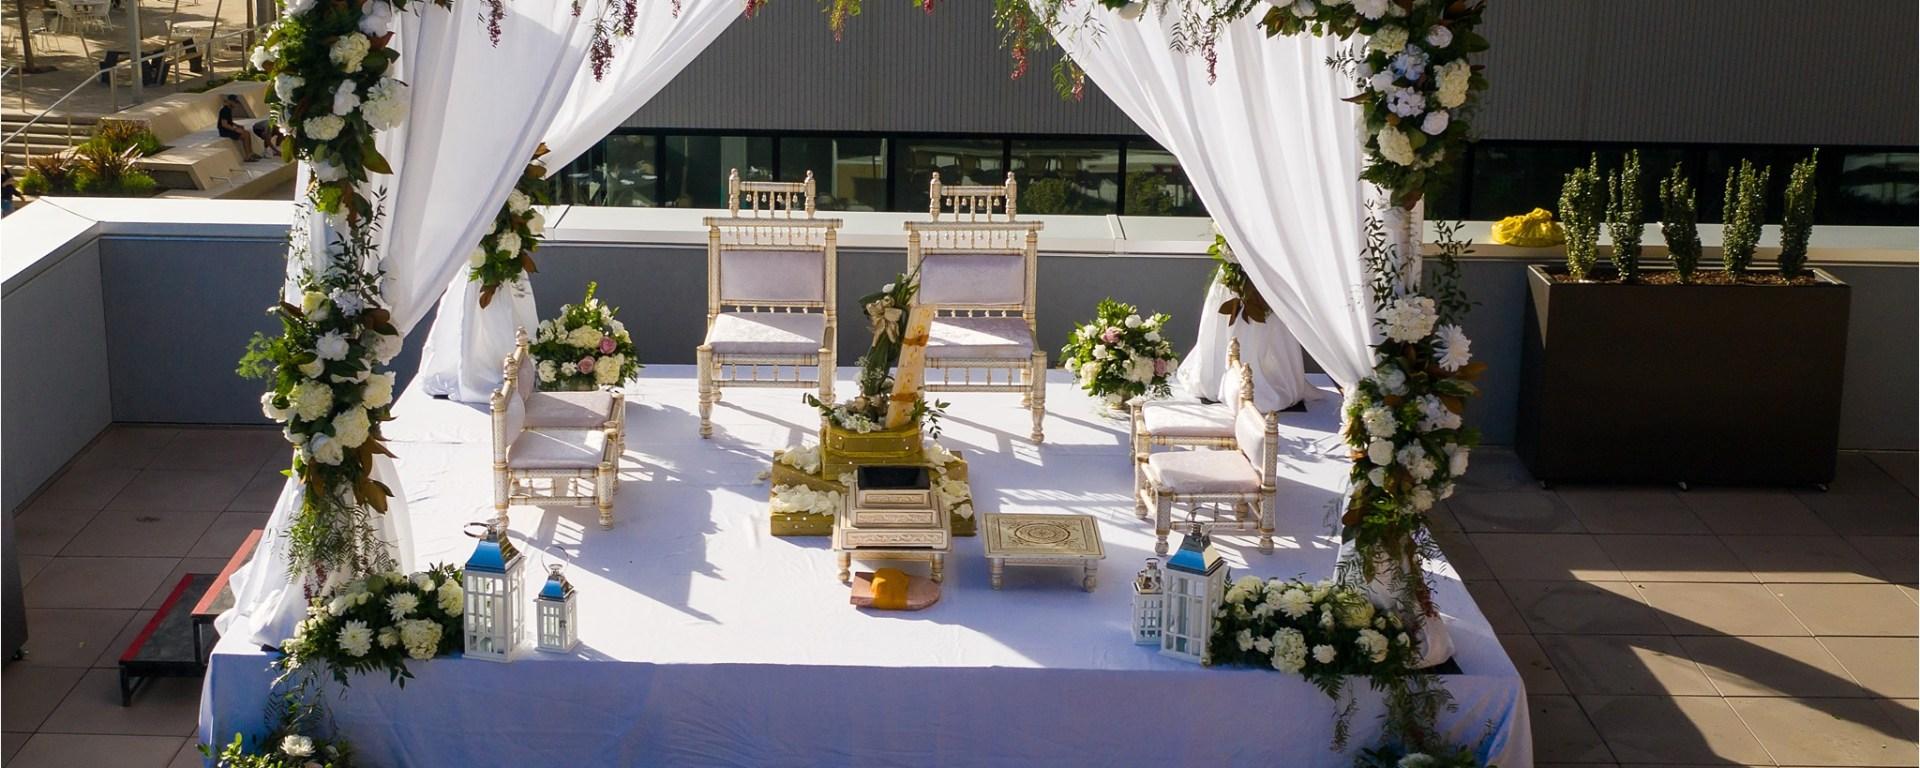 Mandap for an Indian wedding at Sawyer Hotel